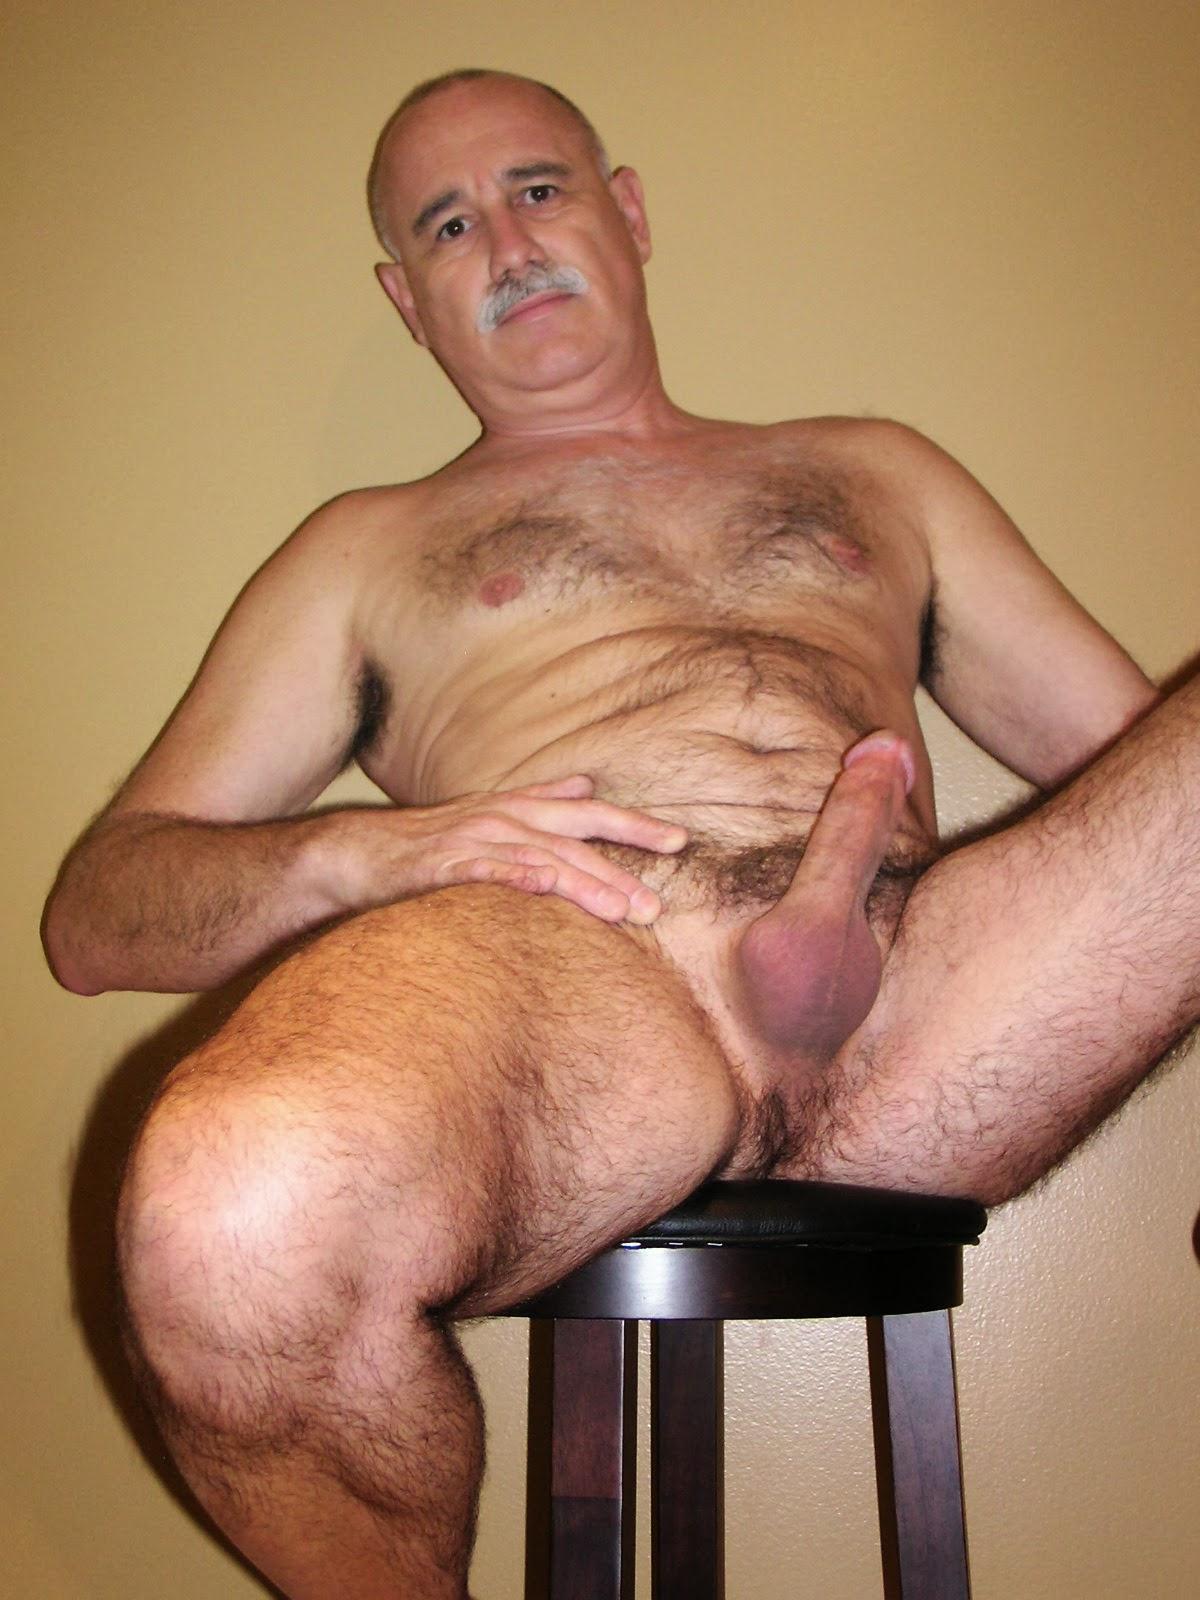 Grease Daddies - Gay mature porn, daddy sex, gay daddies